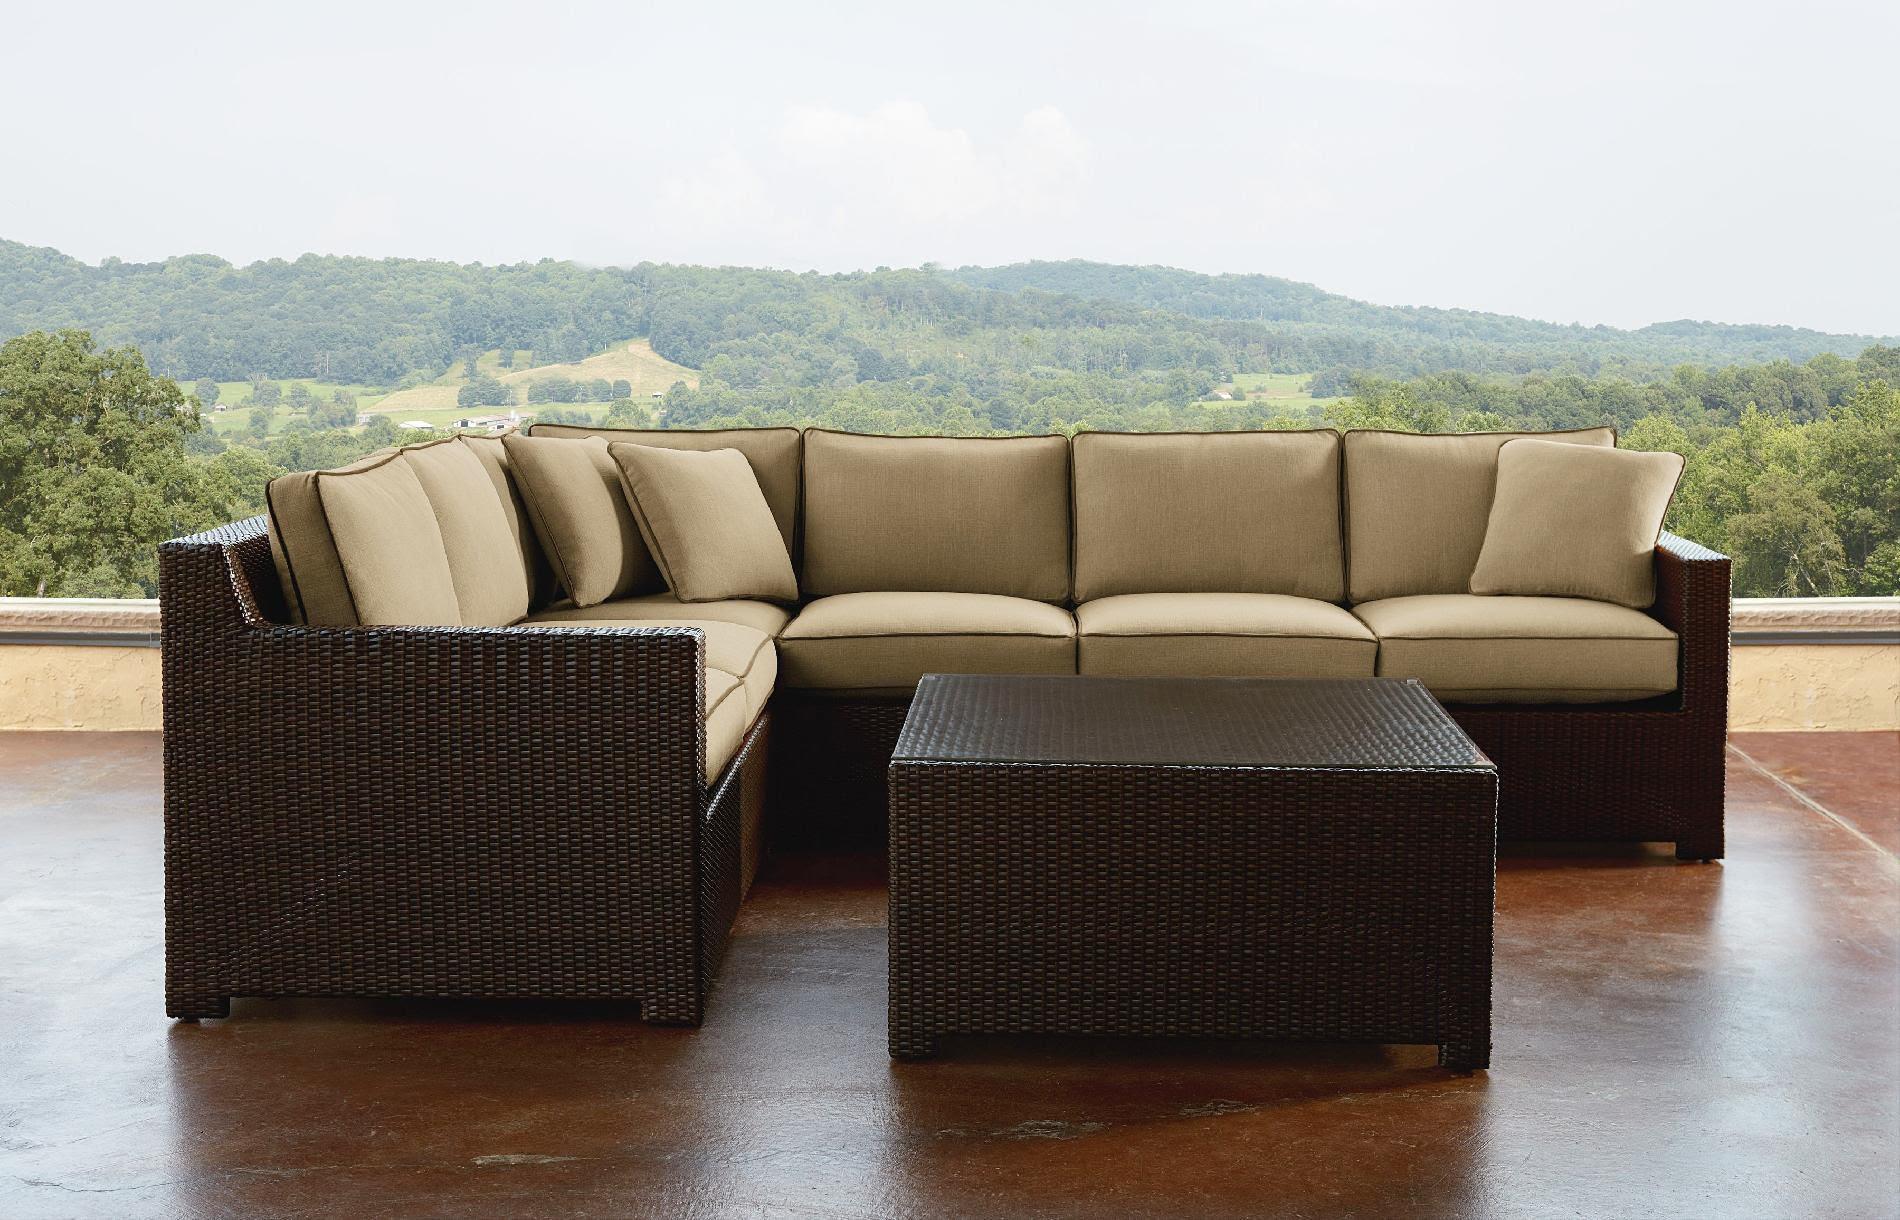 Outdoor Patio Furniture: Umbrellas, Cushions, Chairs ...